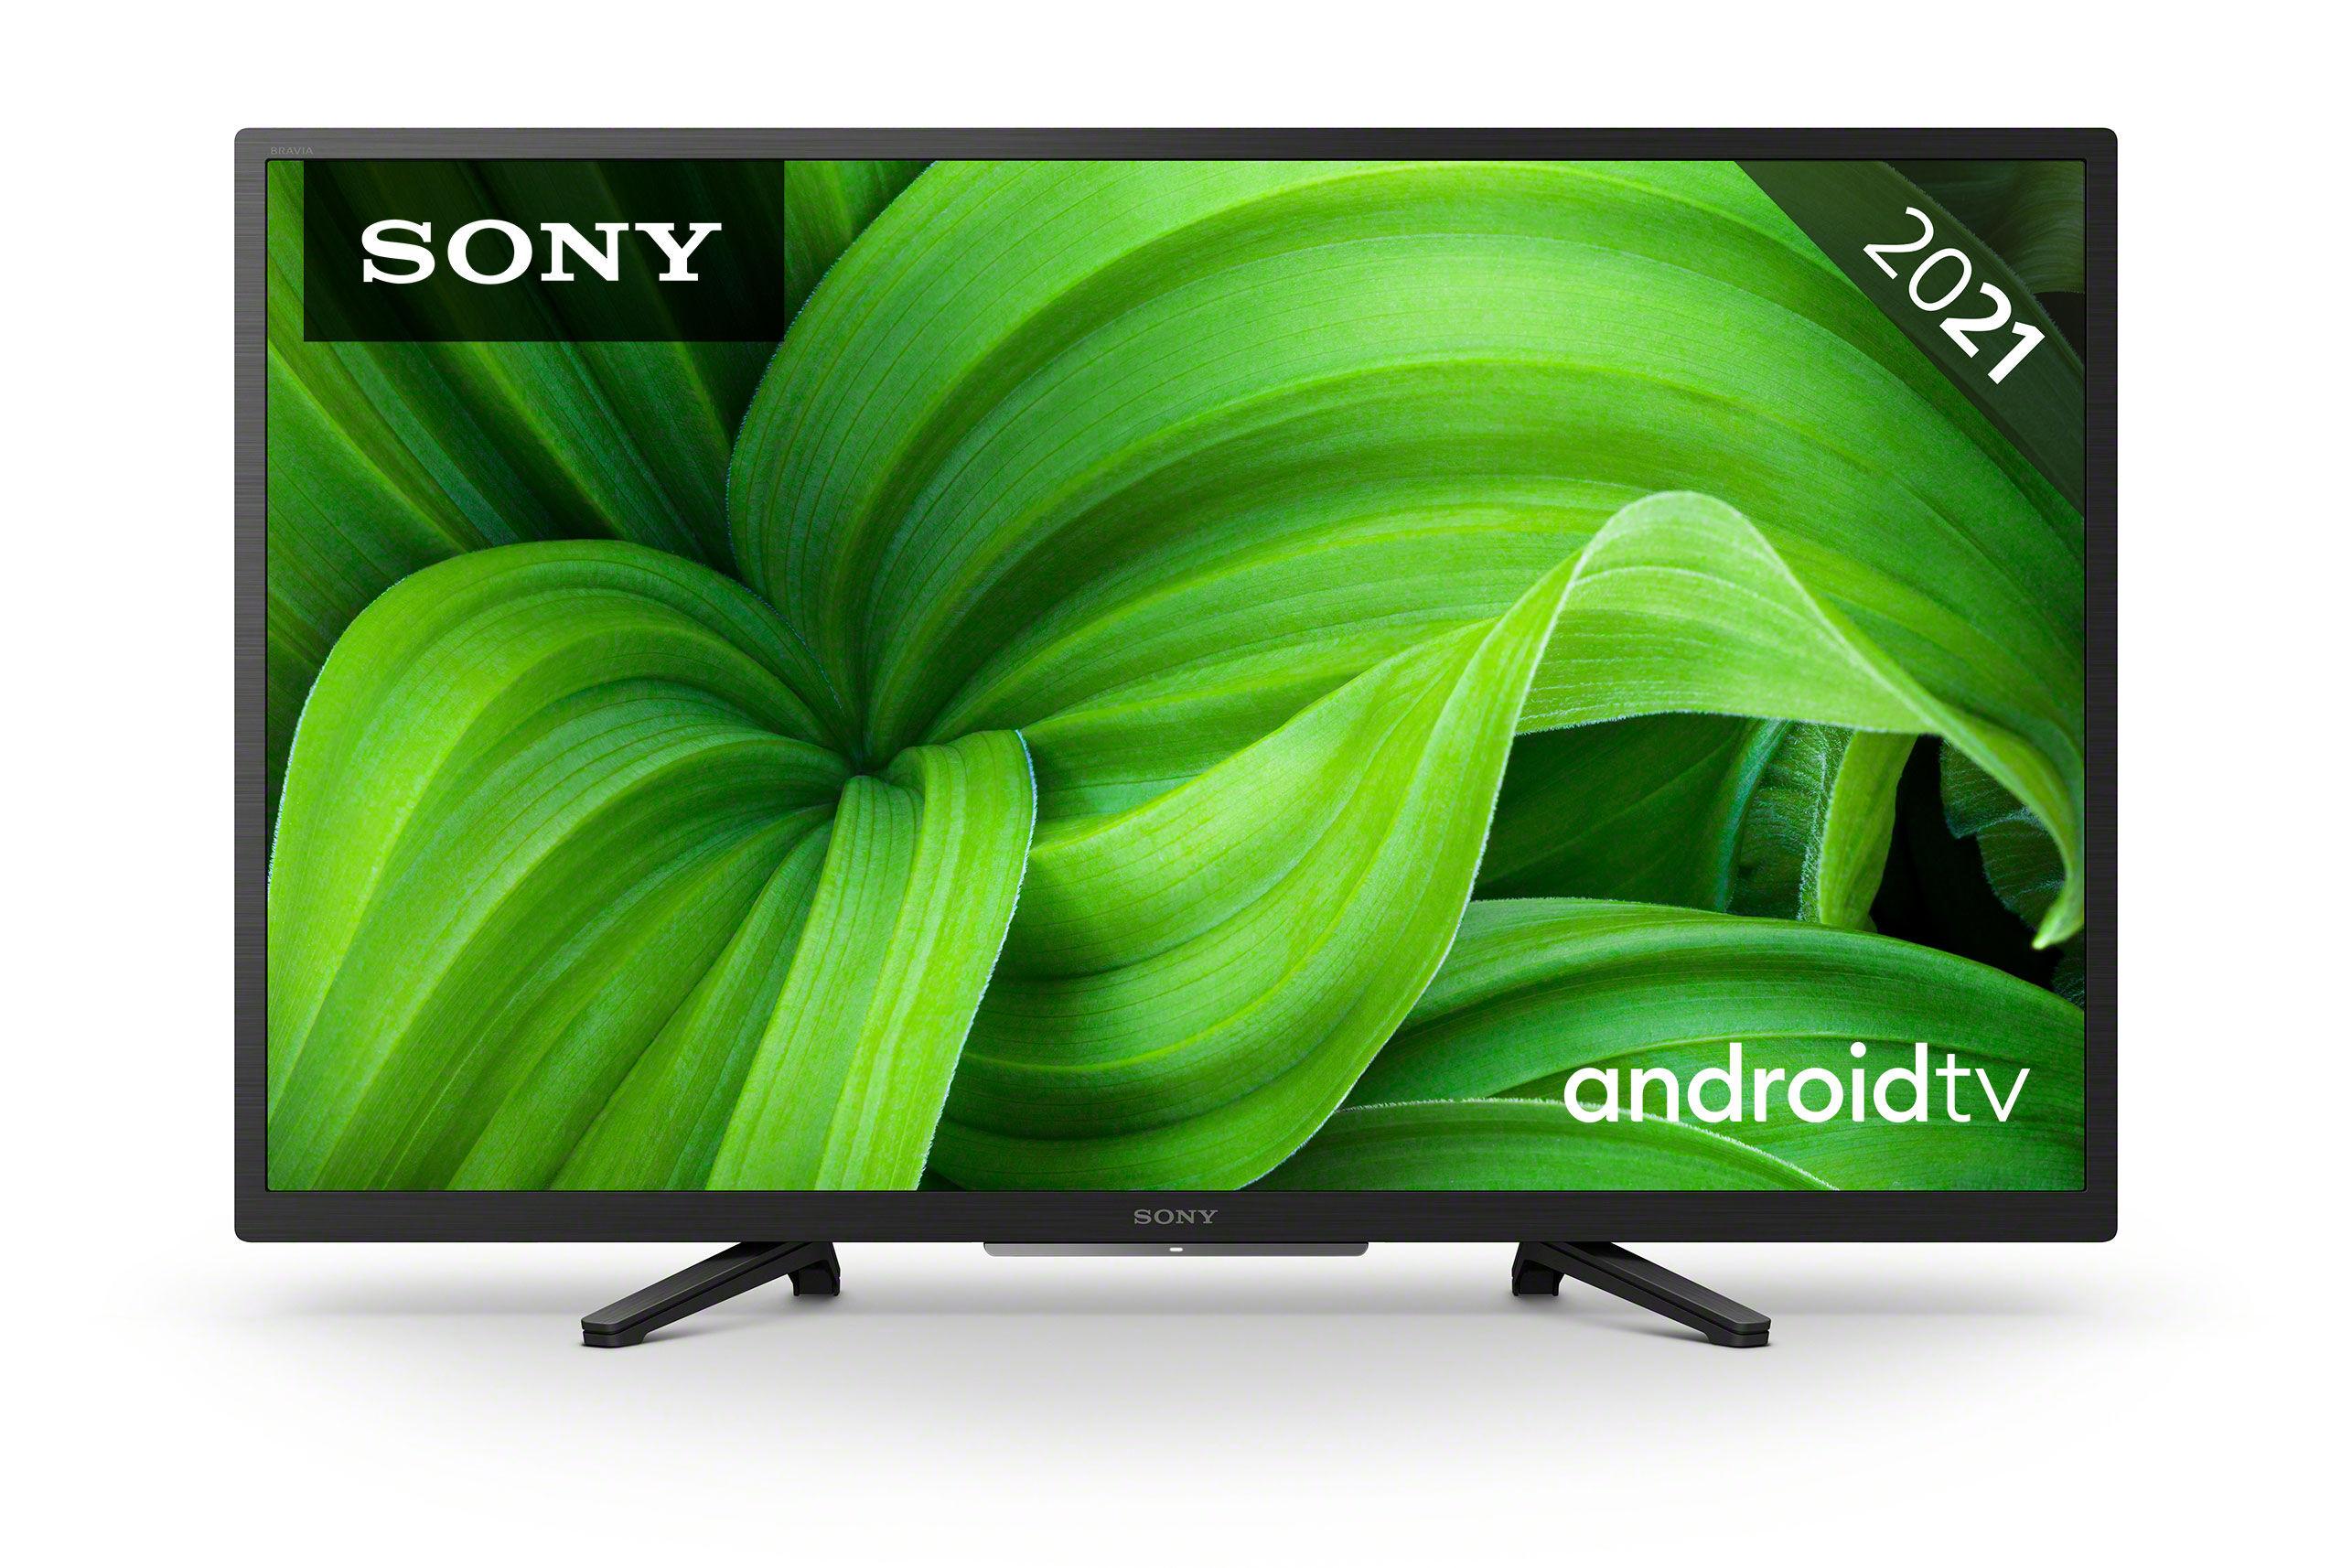 Sony BRAVIA KD-32W800 32 pollici – HD Ready High Dynamic Range (HDR)